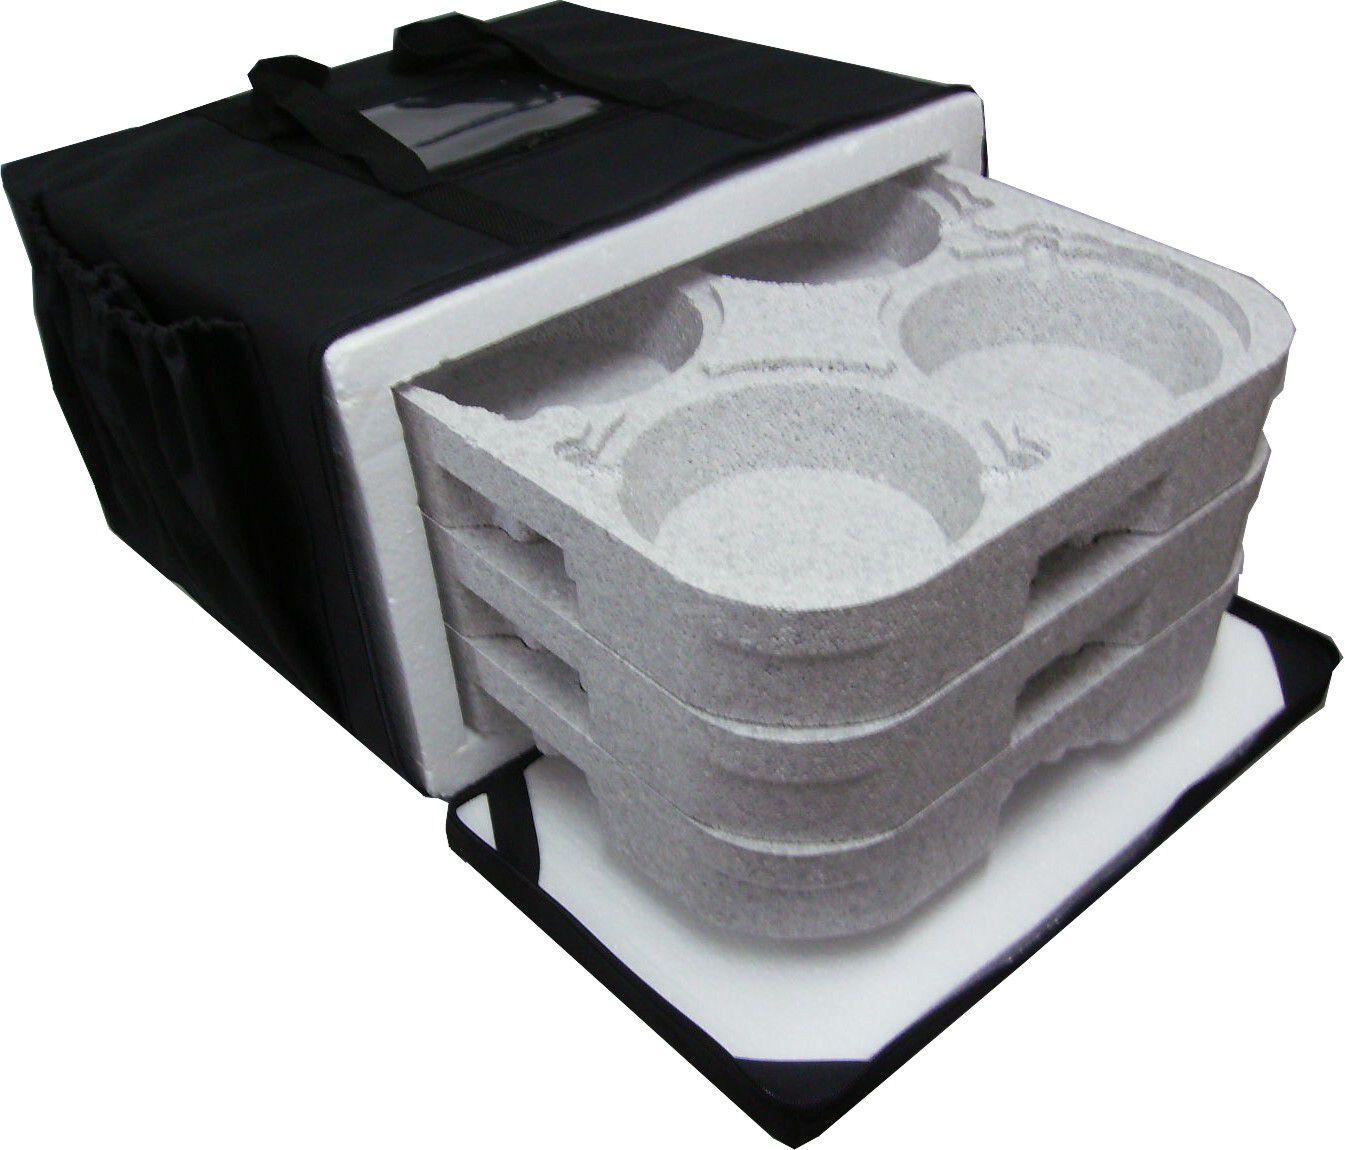 Bolsa Mochila Para Entrega De Marmitex Alumínio 8 E 9 - 12m  - GuerreiroOnline